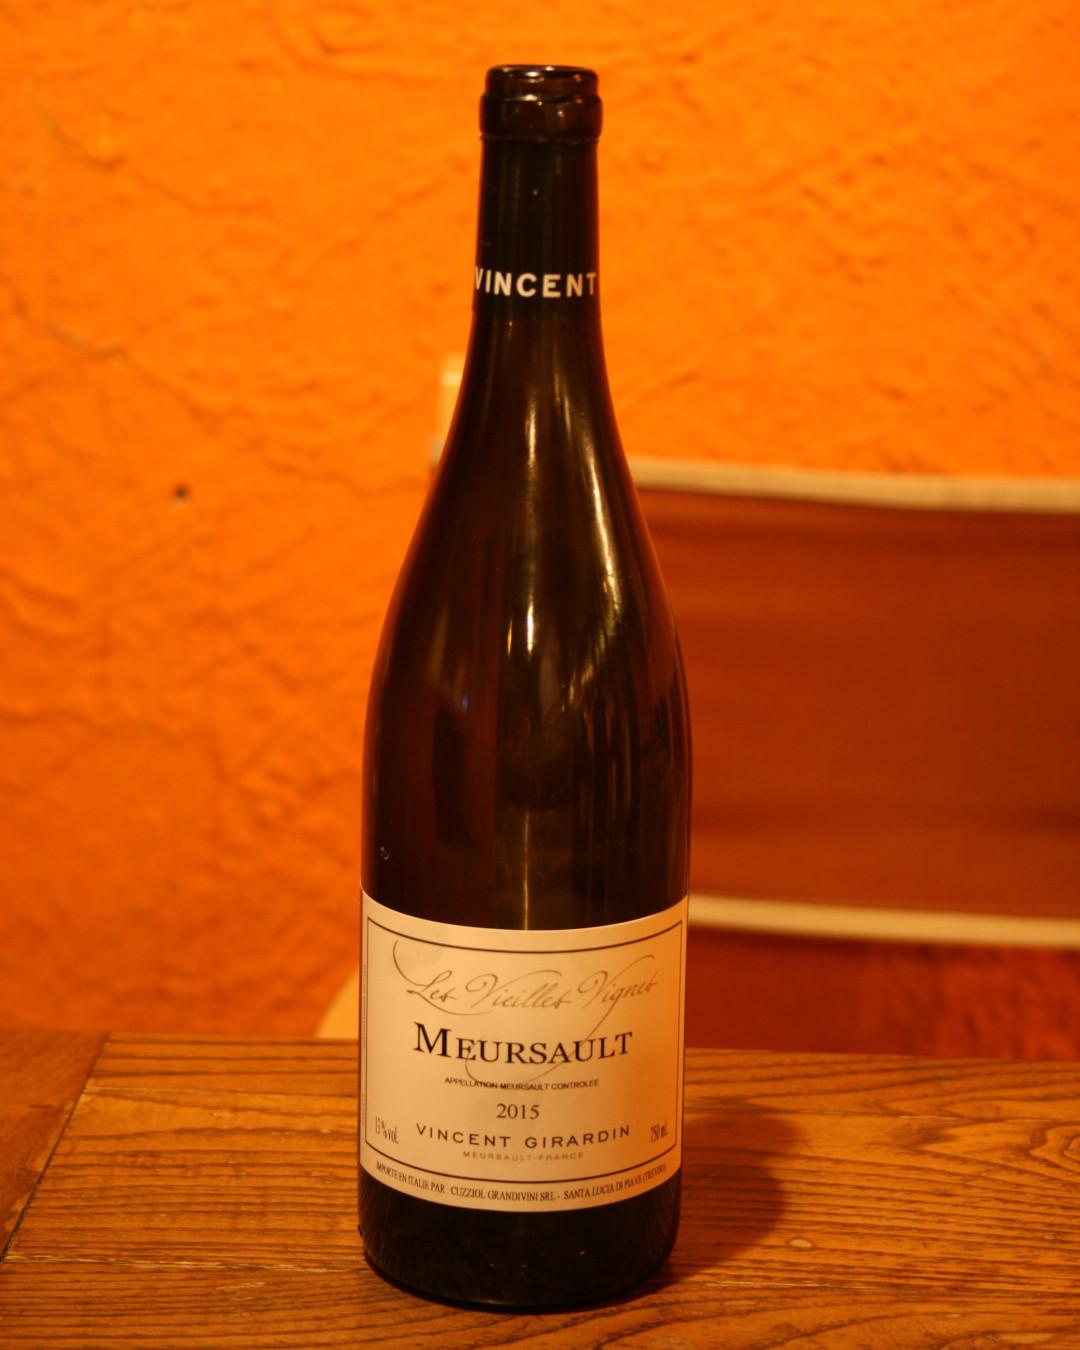 Mersault Vieilles Vignes 2015 Vincent Girardin